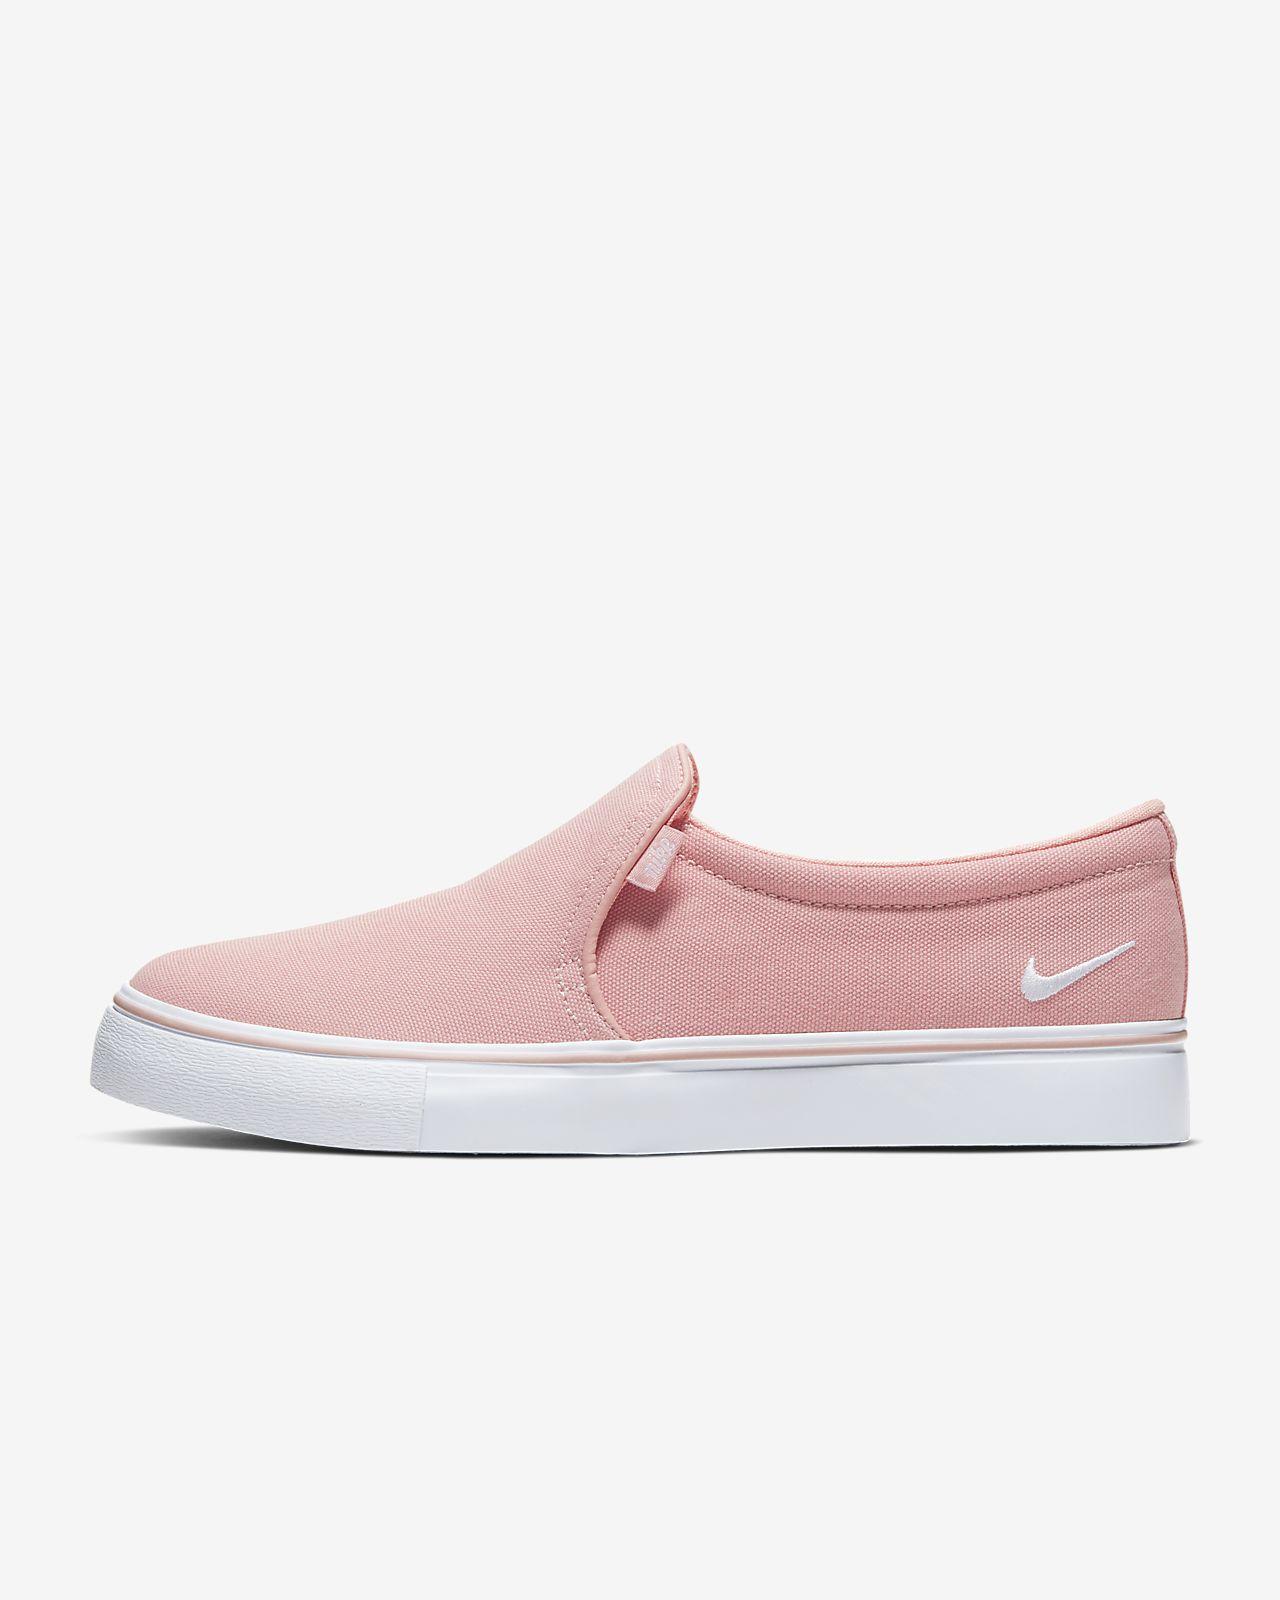 NikeCourt Royale AC Women's Slip-On Shoe